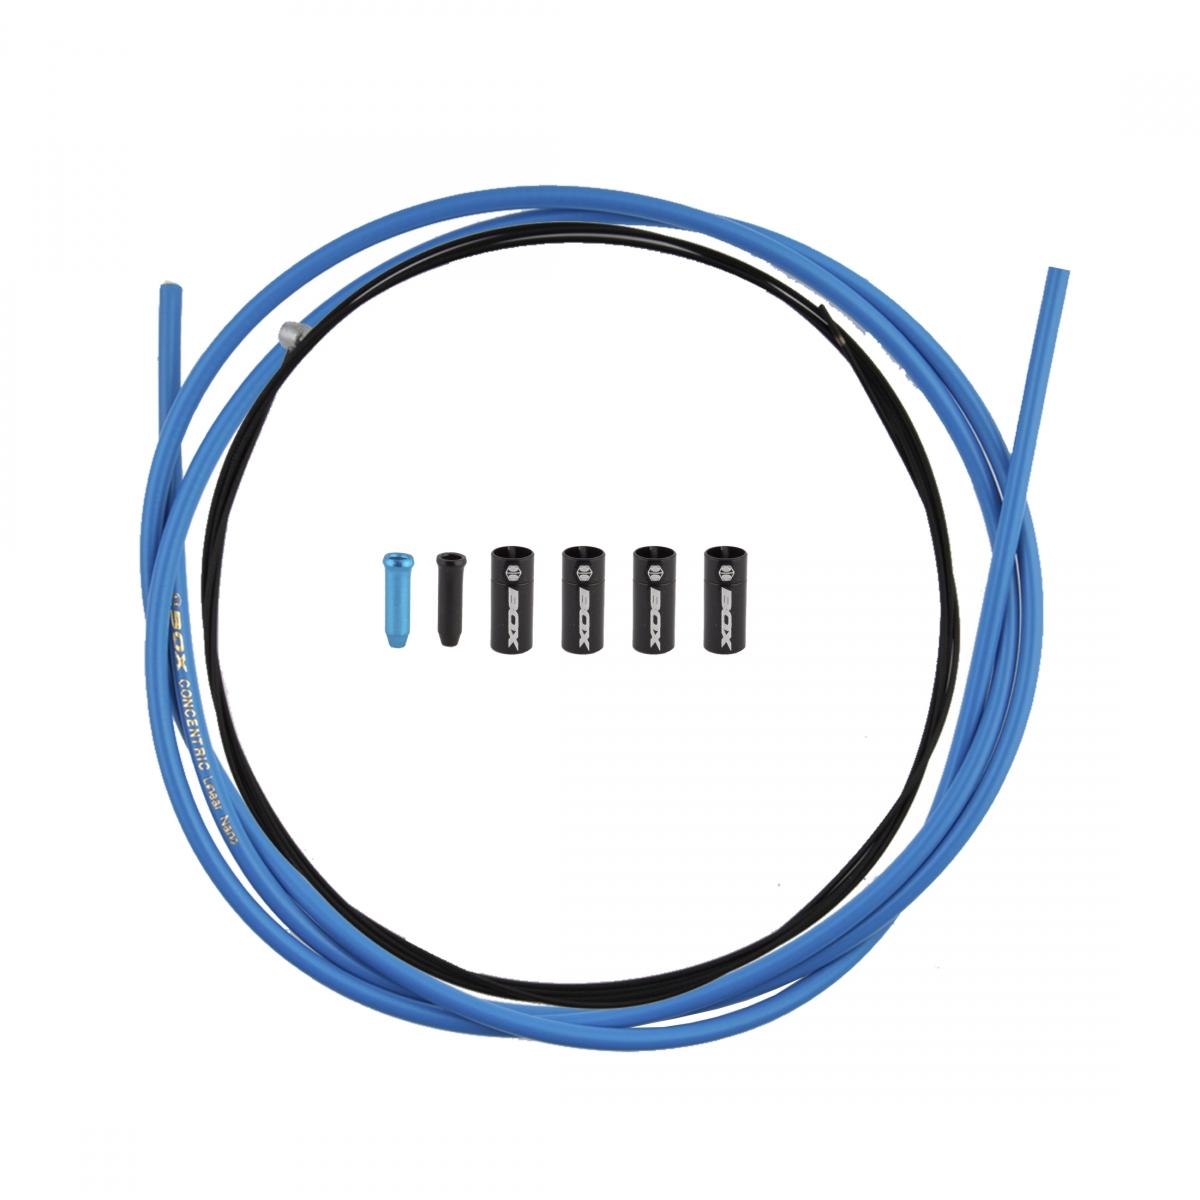 Black Ops DefendR Brake Cable Kit Cable Brake Kit Bmx Ftorrr L-bu Ss-tef 71x83in